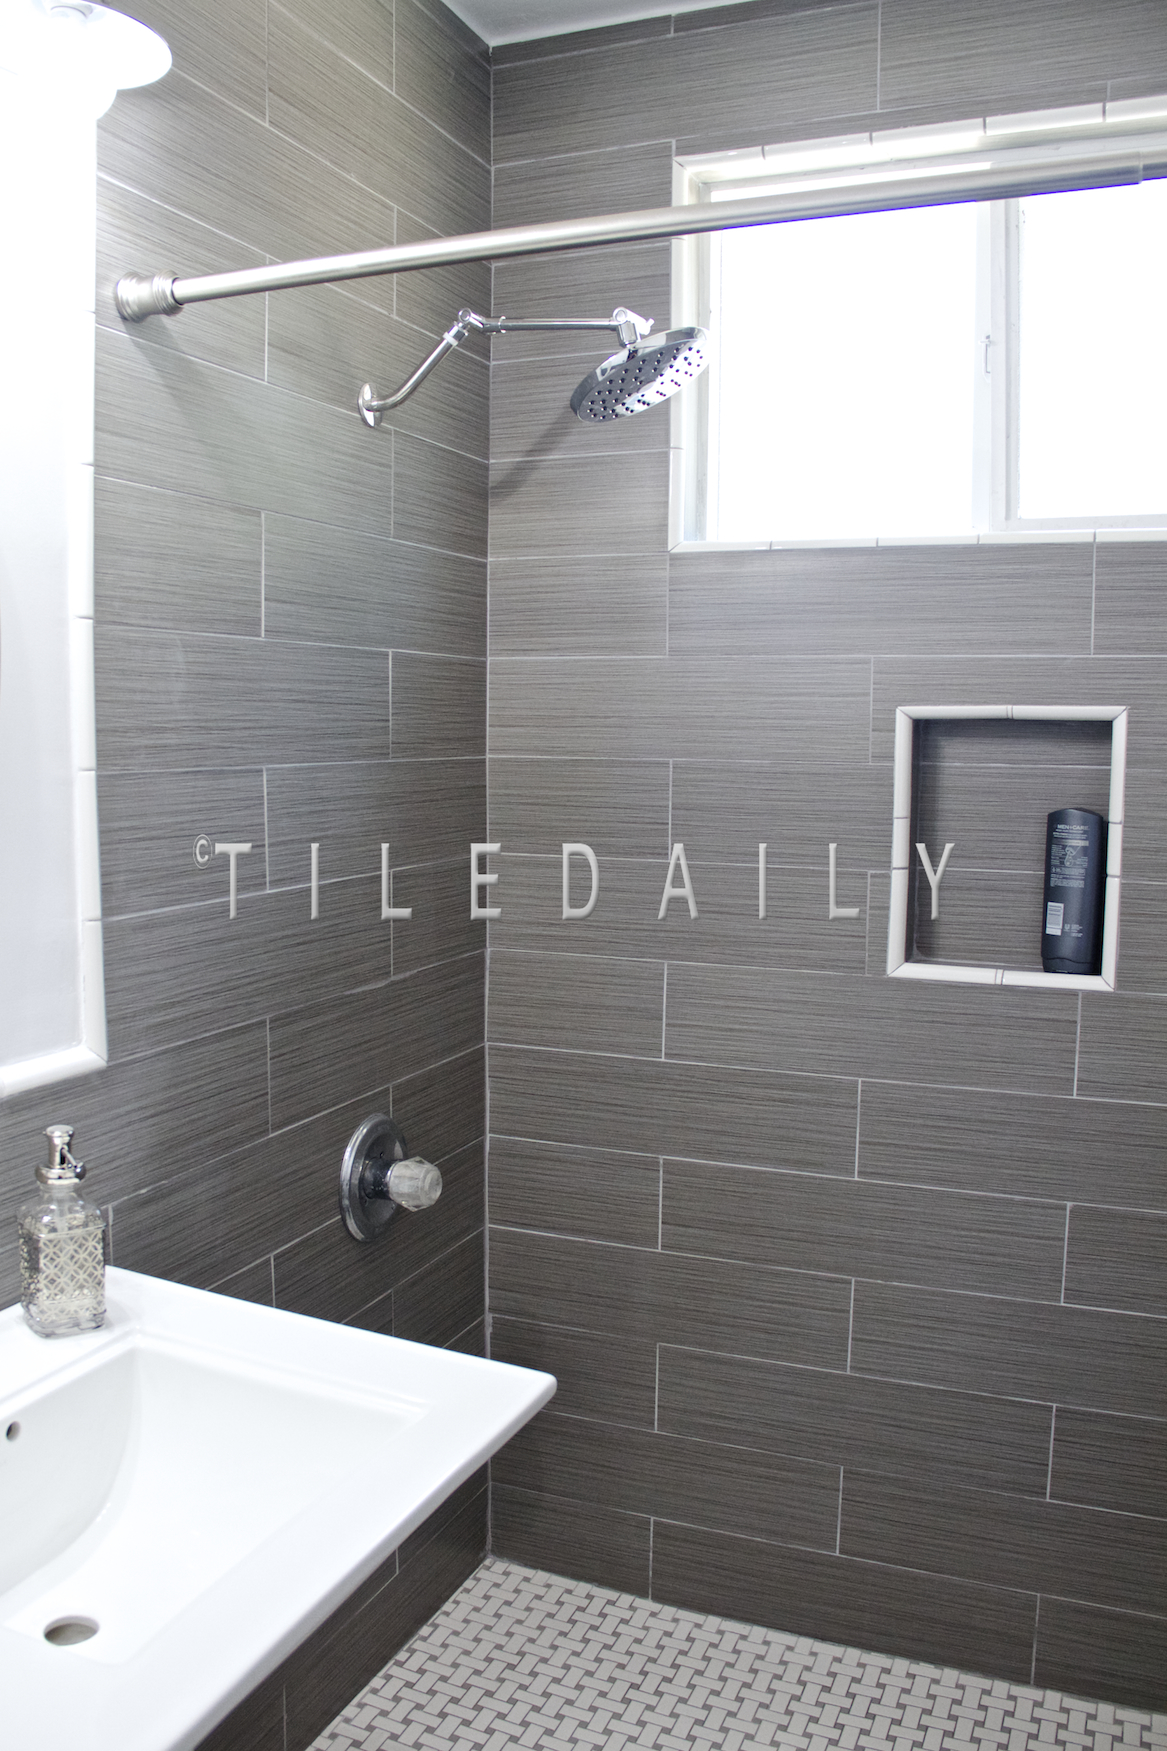 6x24 - Bamboo Pattern Porcelain Tile Grey